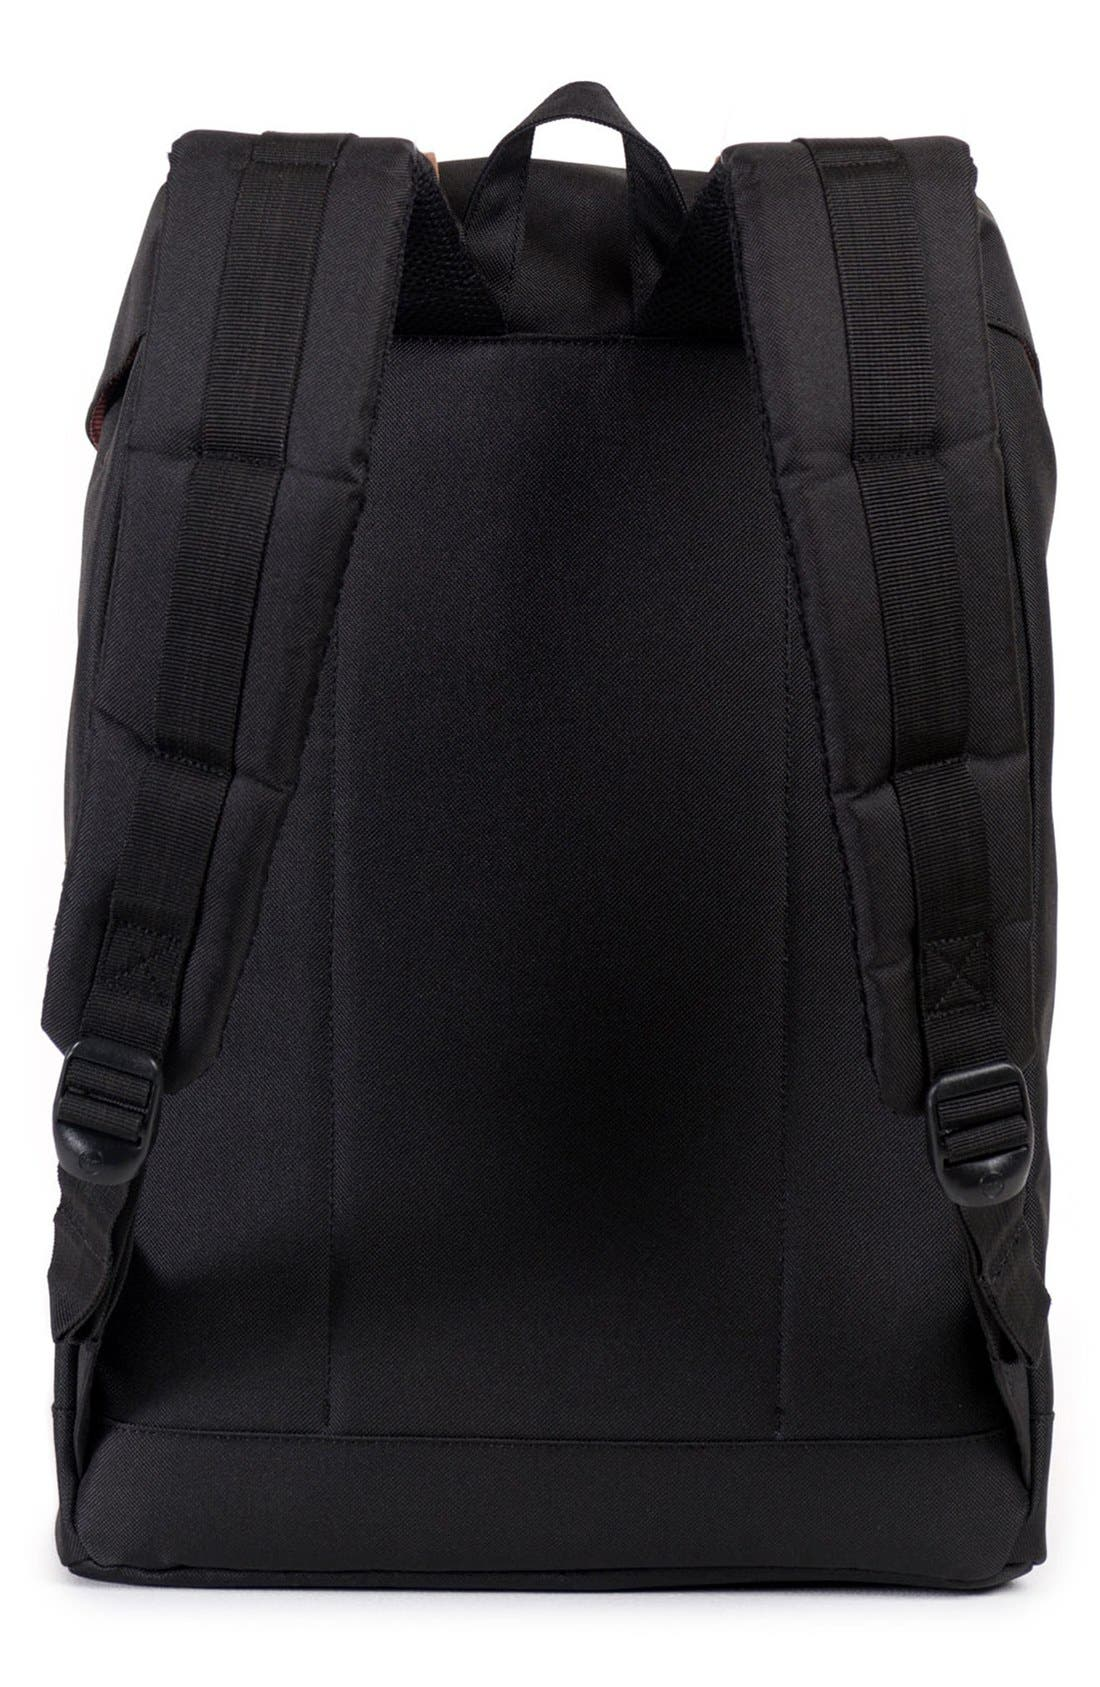 Alternate Image 2  - Herschel Supply Co. 'Retreat' Backpack